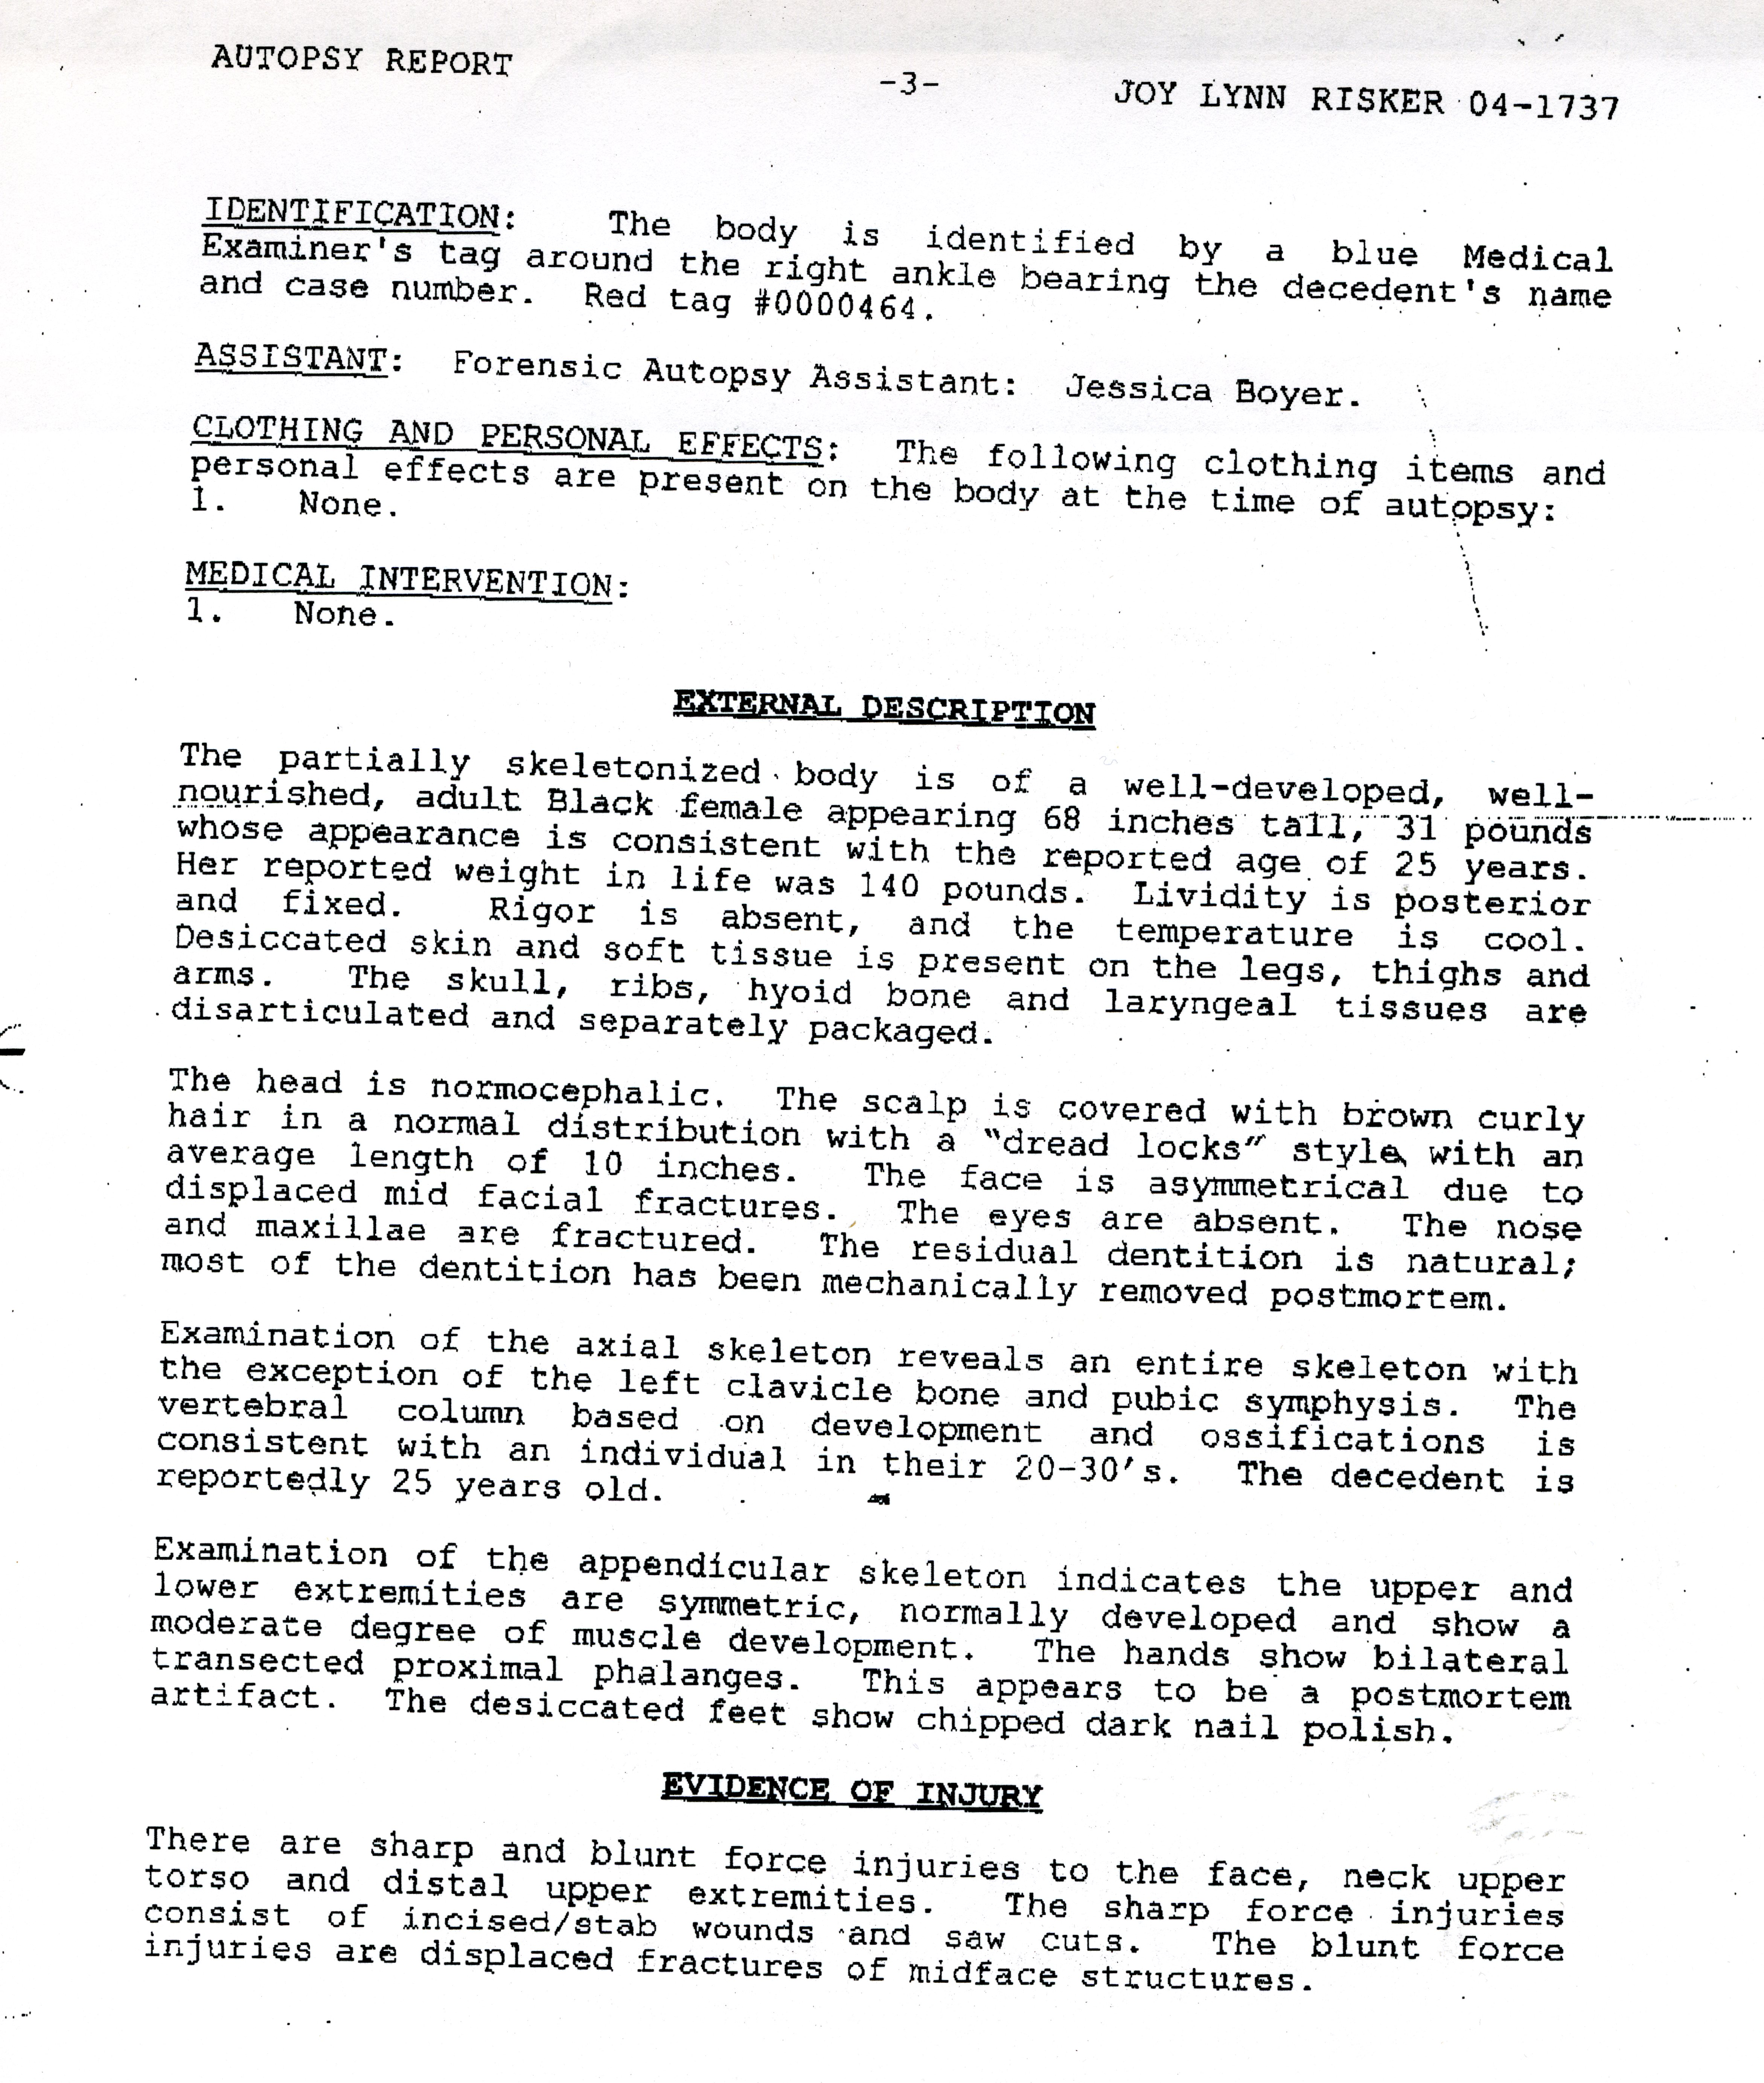 princess diana autopsy report pdf